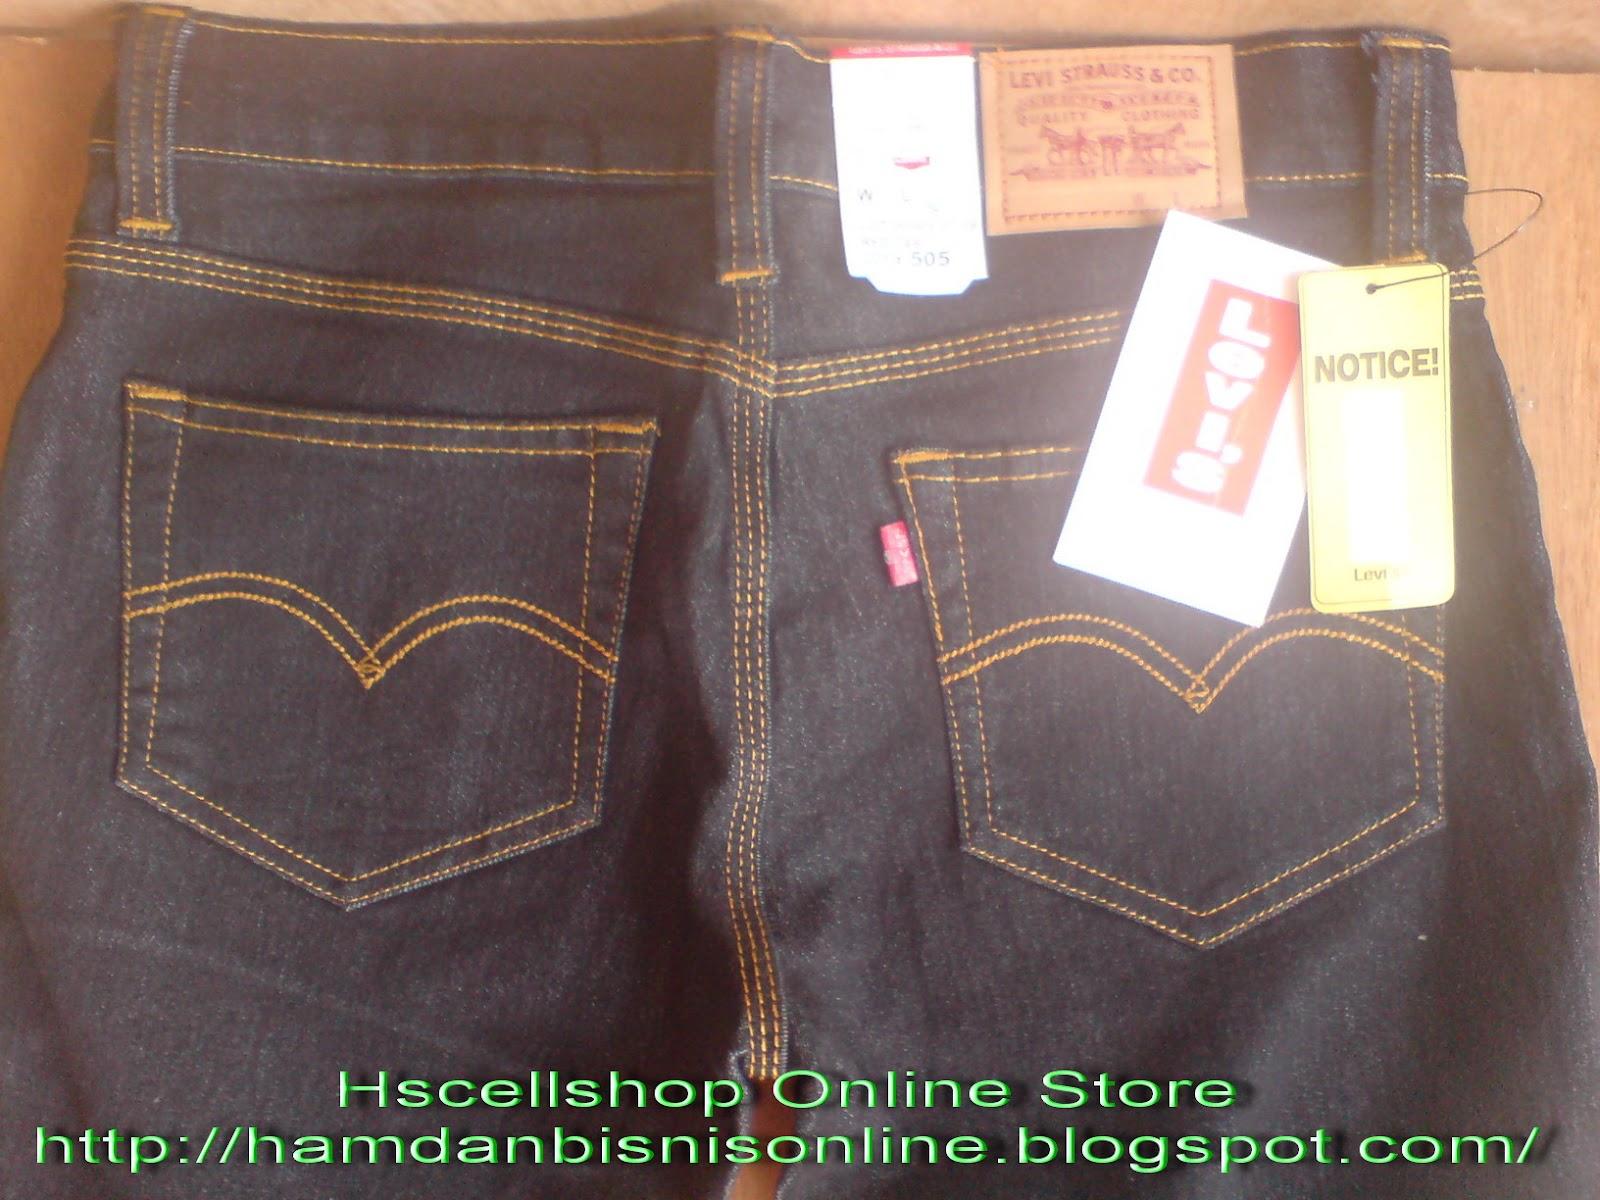 Celana Jeans Wanita Levis Code CL002